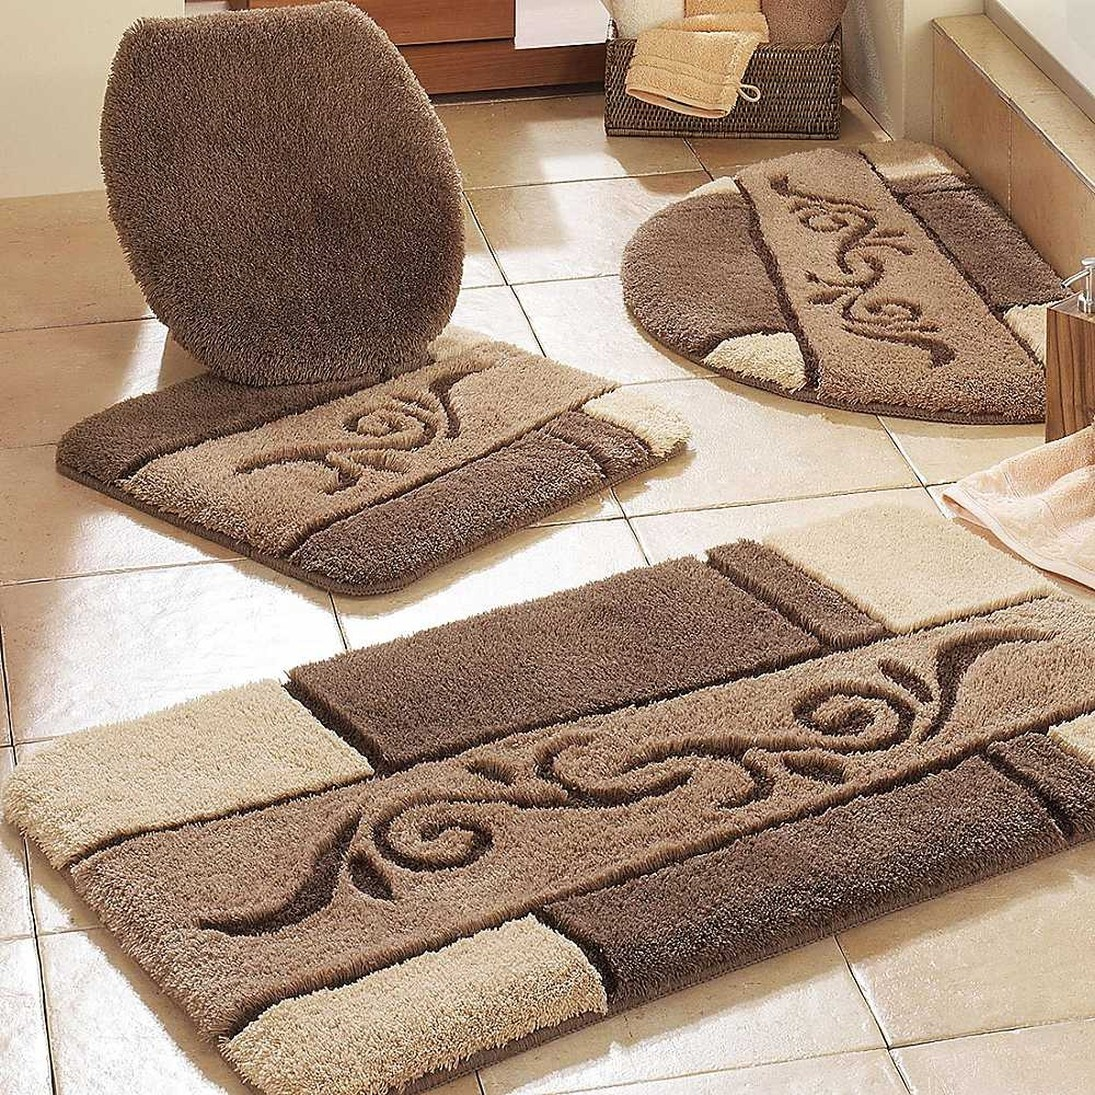 designer bath rugs and mats ideas on foter rh foter com Best Bathroom Rugs and Mats Beautiful Bath Rugs